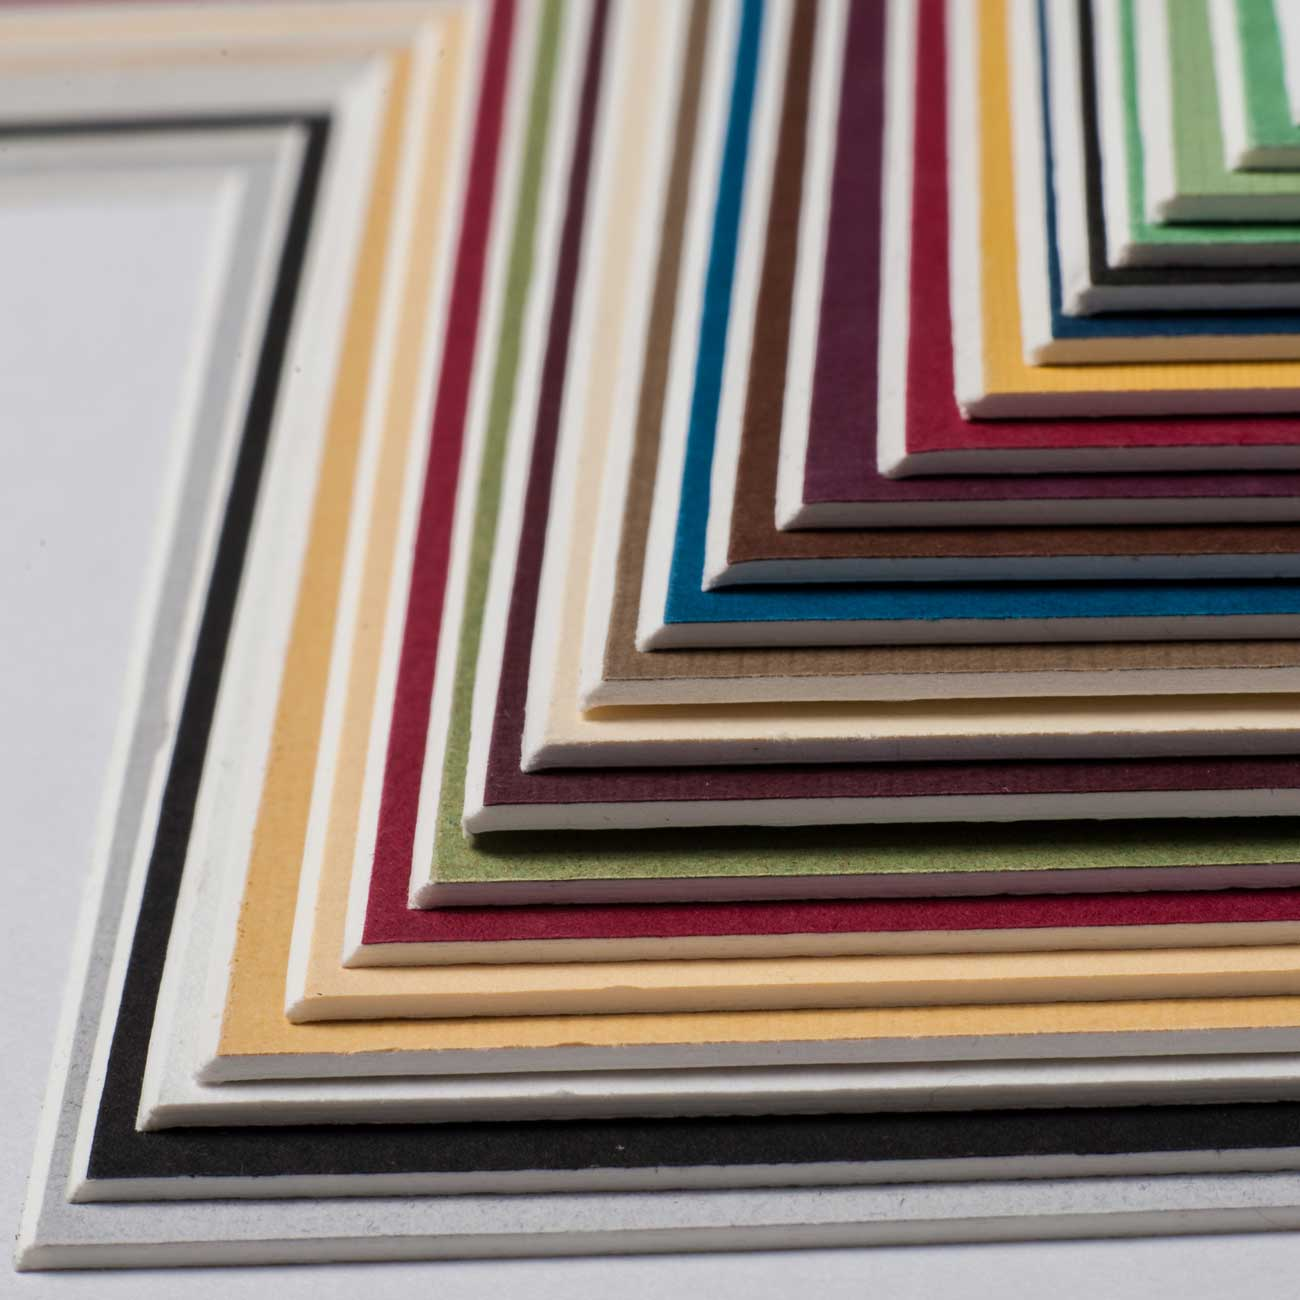 aicham larson juhl 1 4 mm whitecore passepartout als ma anfertigung rust. Black Bedroom Furniture Sets. Home Design Ideas